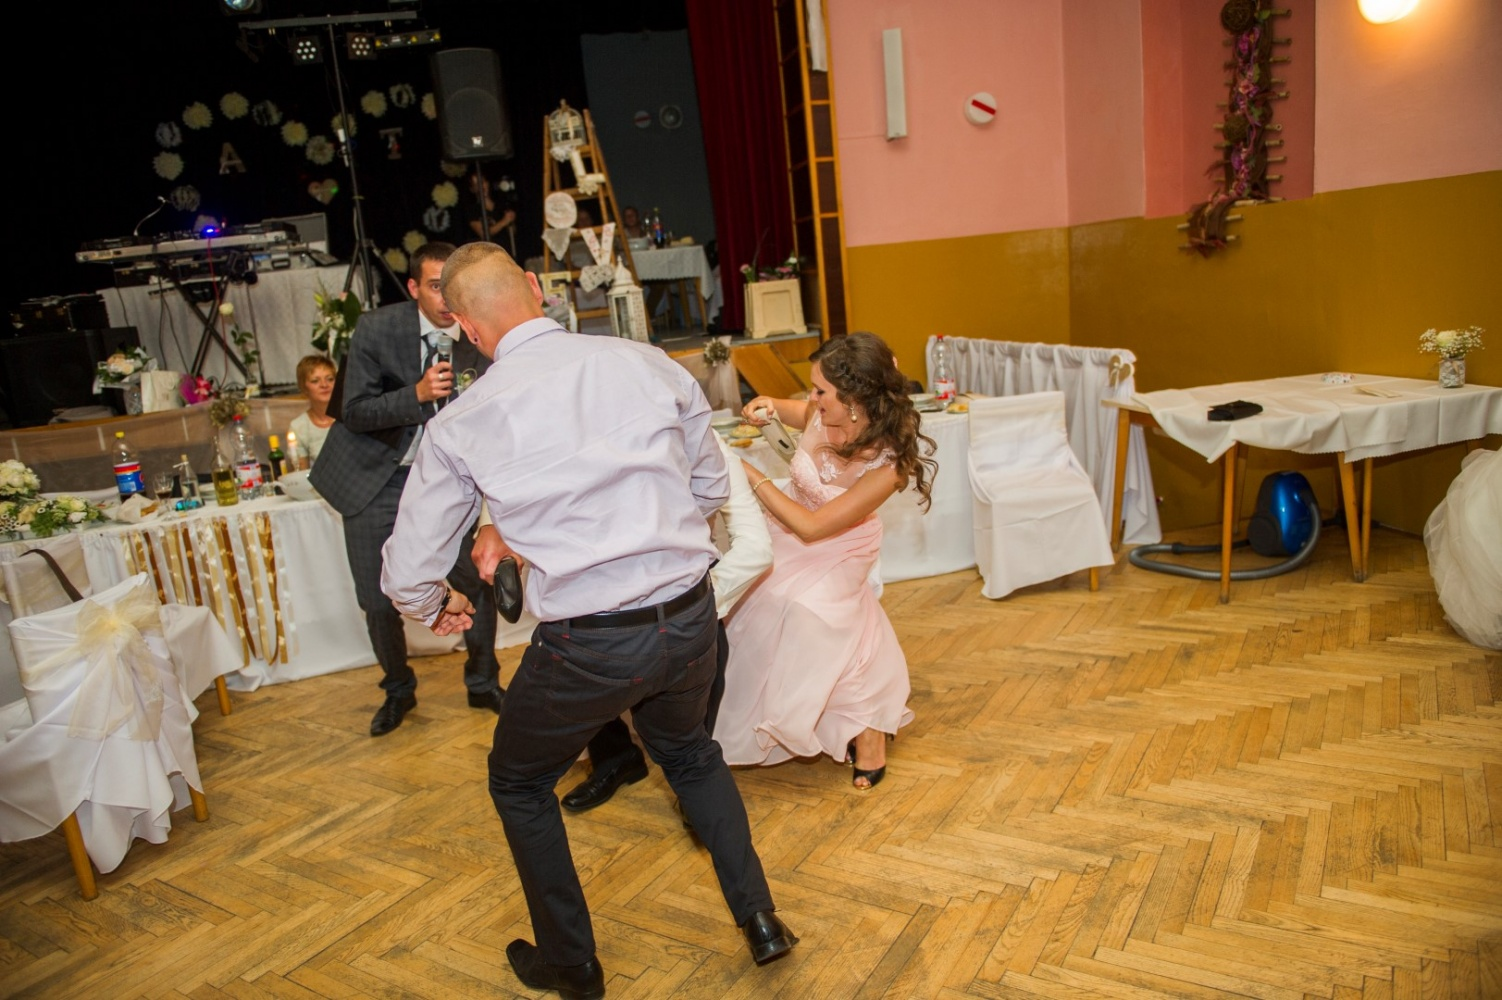 http://www.fotoz.sk/images/gallery-21/normal/svadobne-fotenie_eskuvoi-fotos_343.jpg